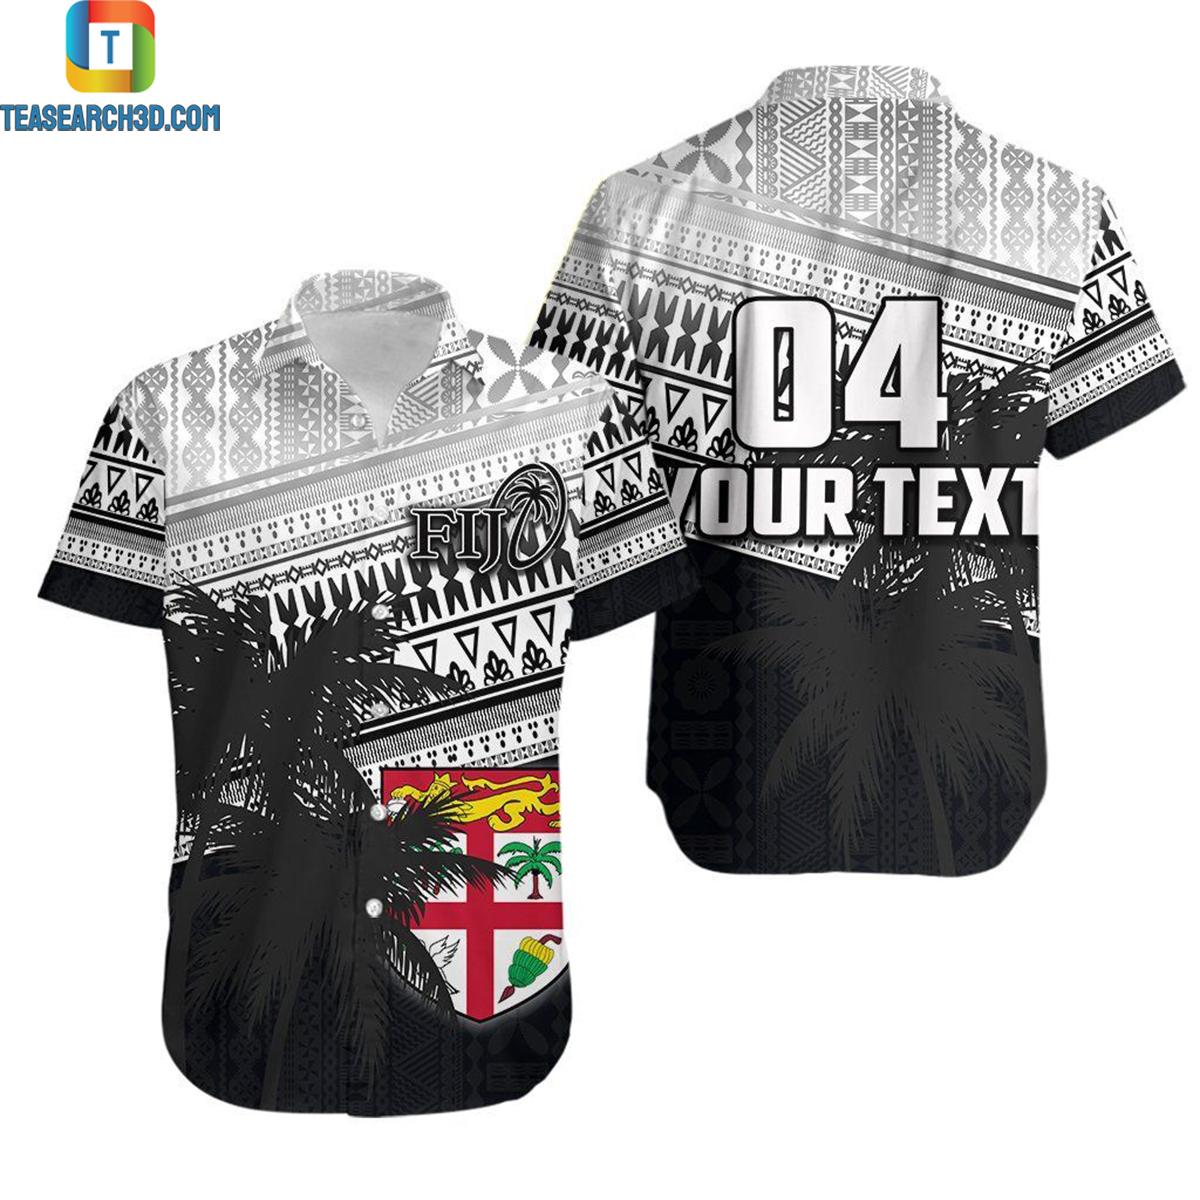 Fiji rugby makare and tapa patterns personalized hawaiian shirt 1